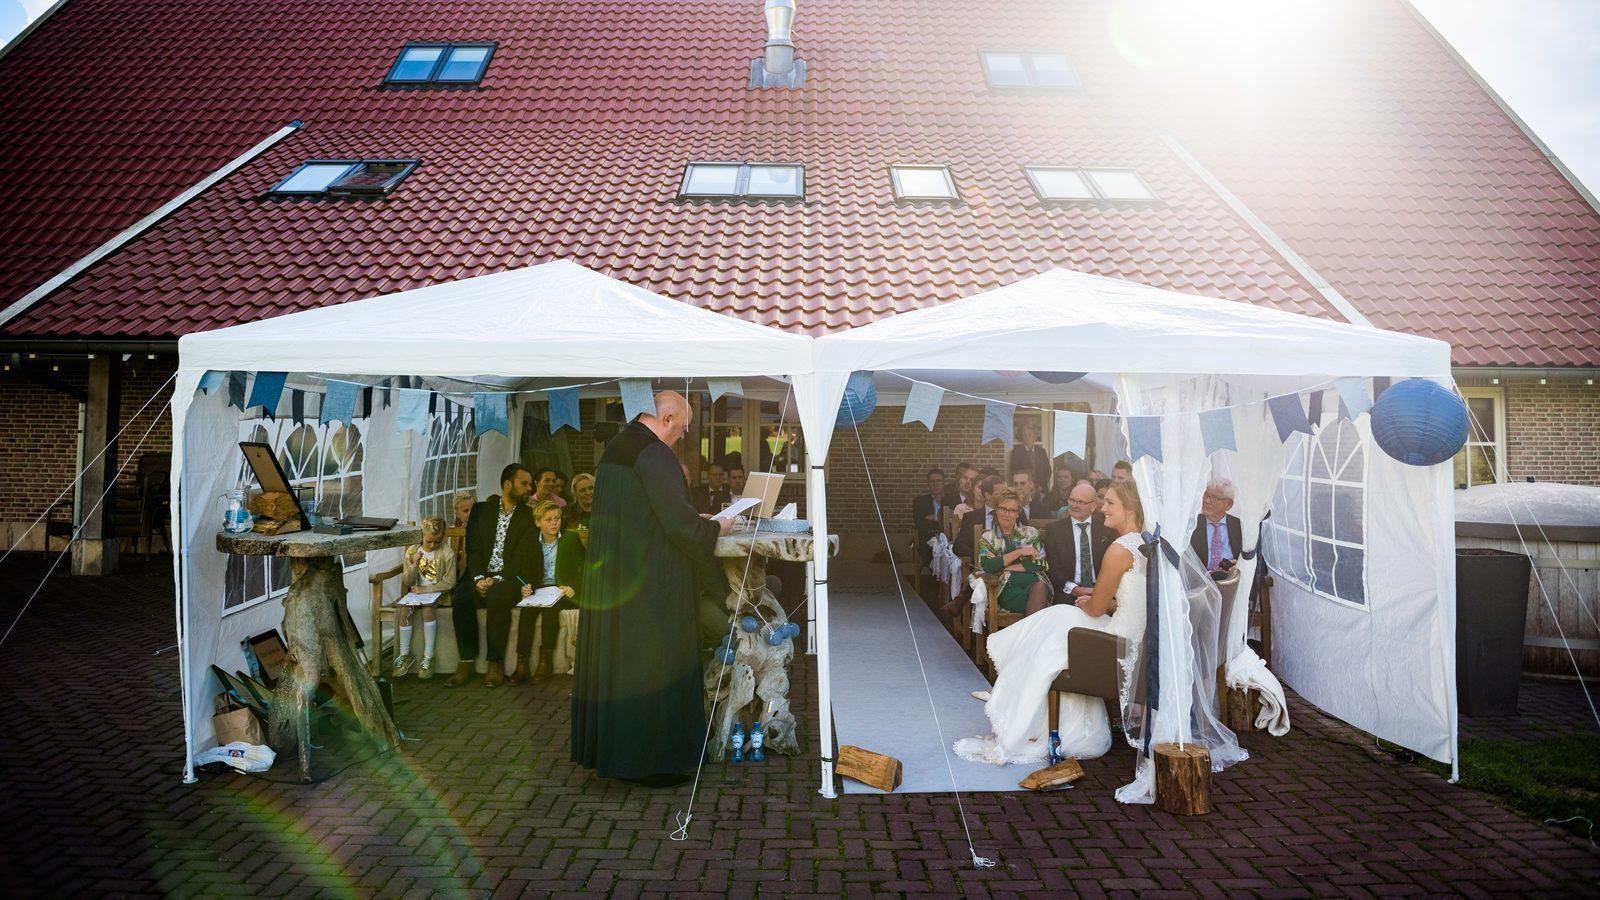 Huwelijk 't Borghuis